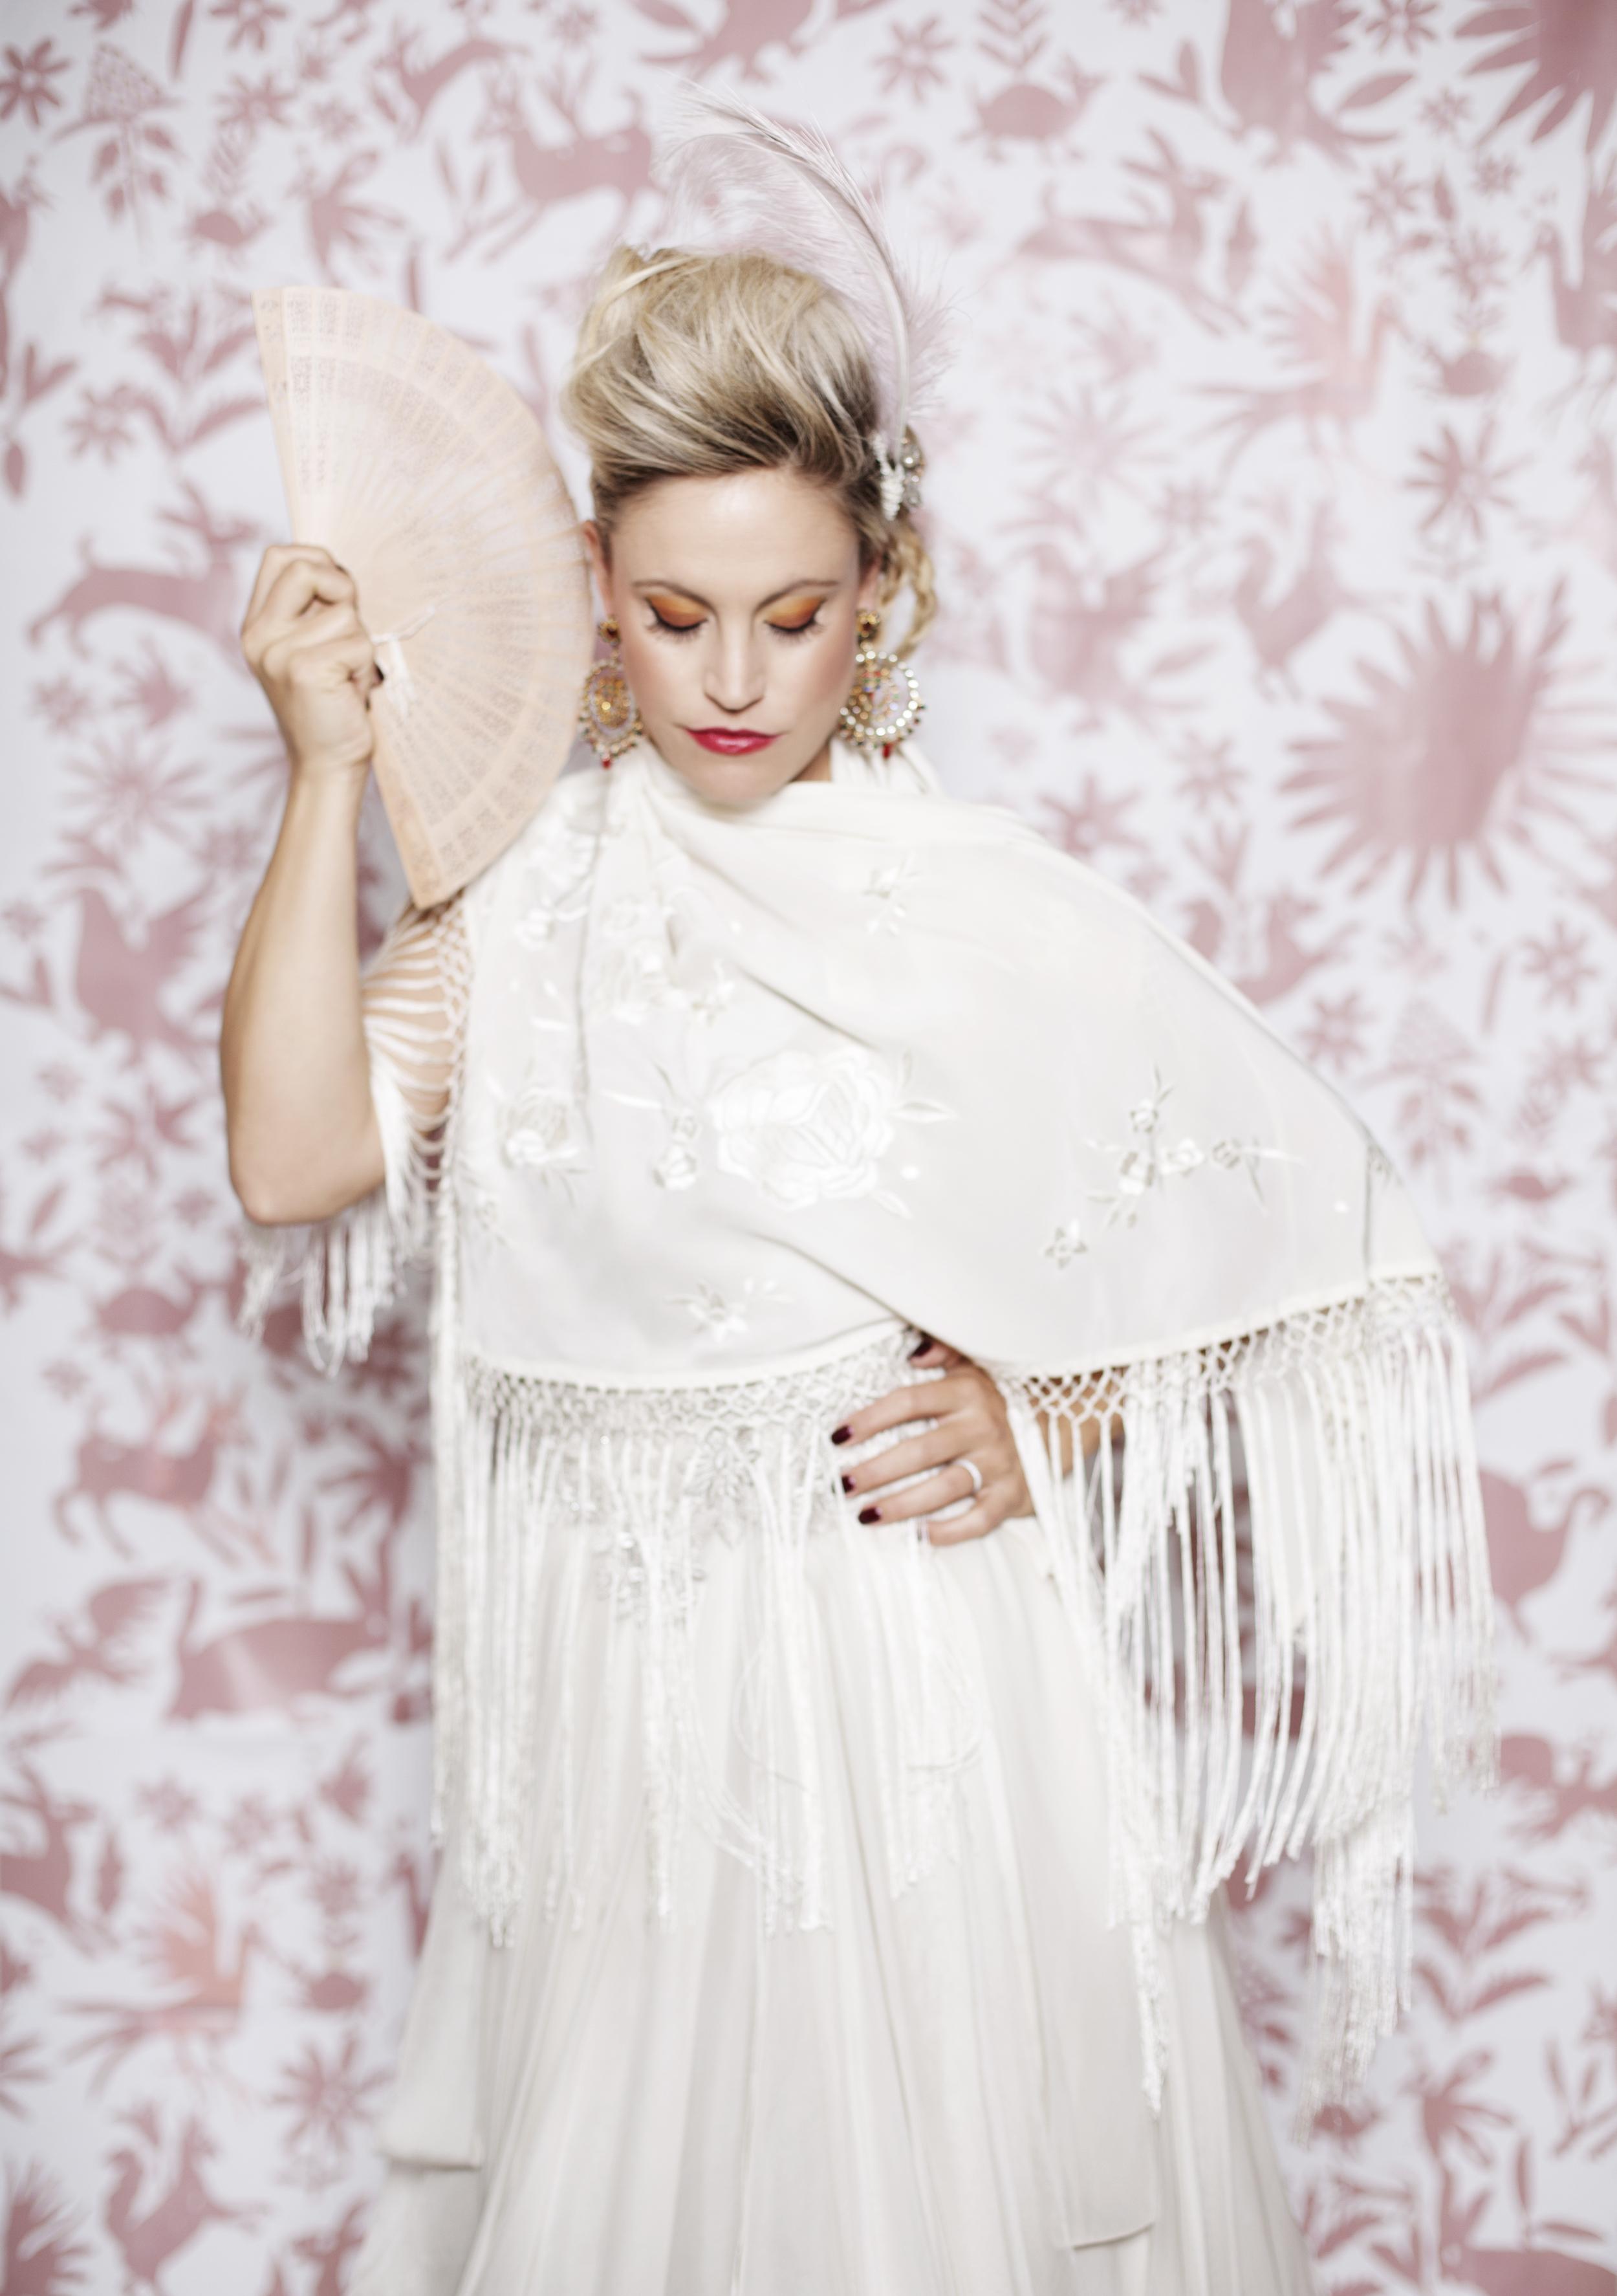 Ceci_New_York_Ceci_Style_Mexico_Wedding_Ceci_Johnson_Otomi_Invitations_Luxury_Custom_Personalized3.jpg